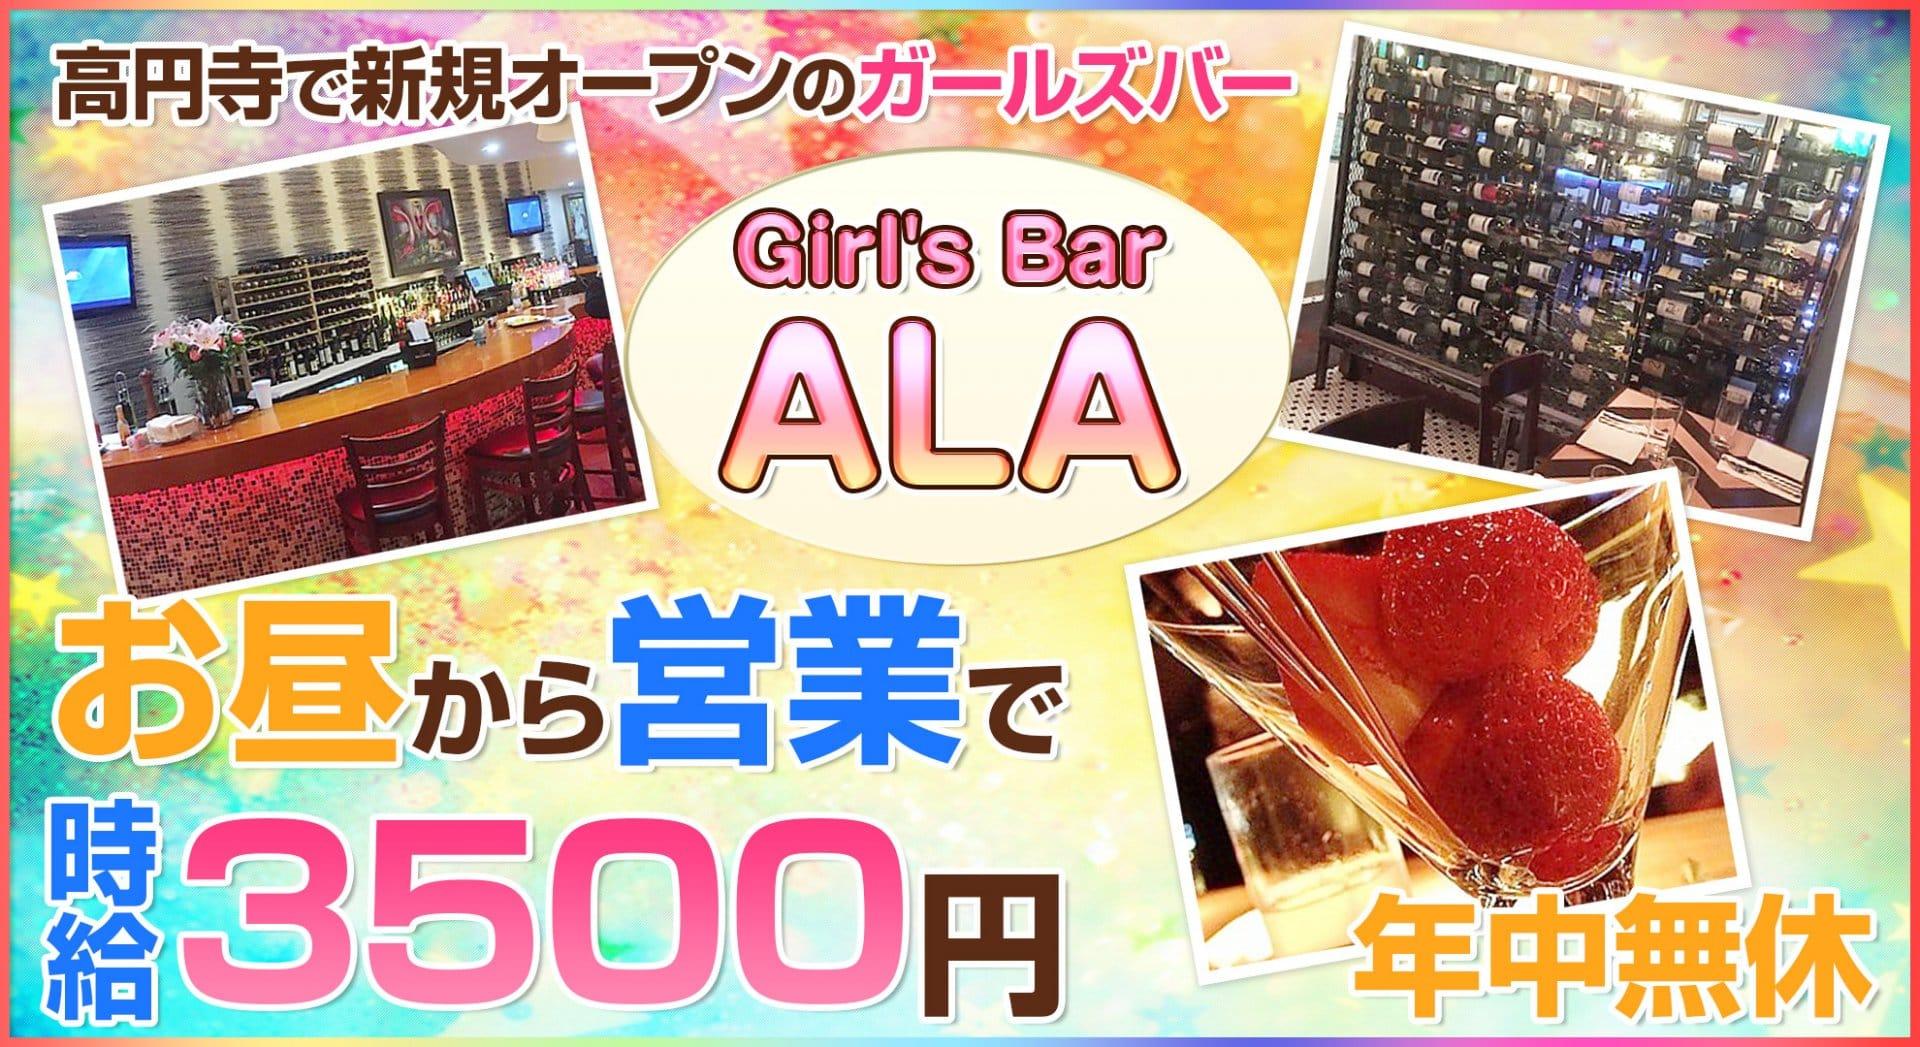 GirlsBar ALA<アーラ> 高円寺 ガールズバー TOP画像